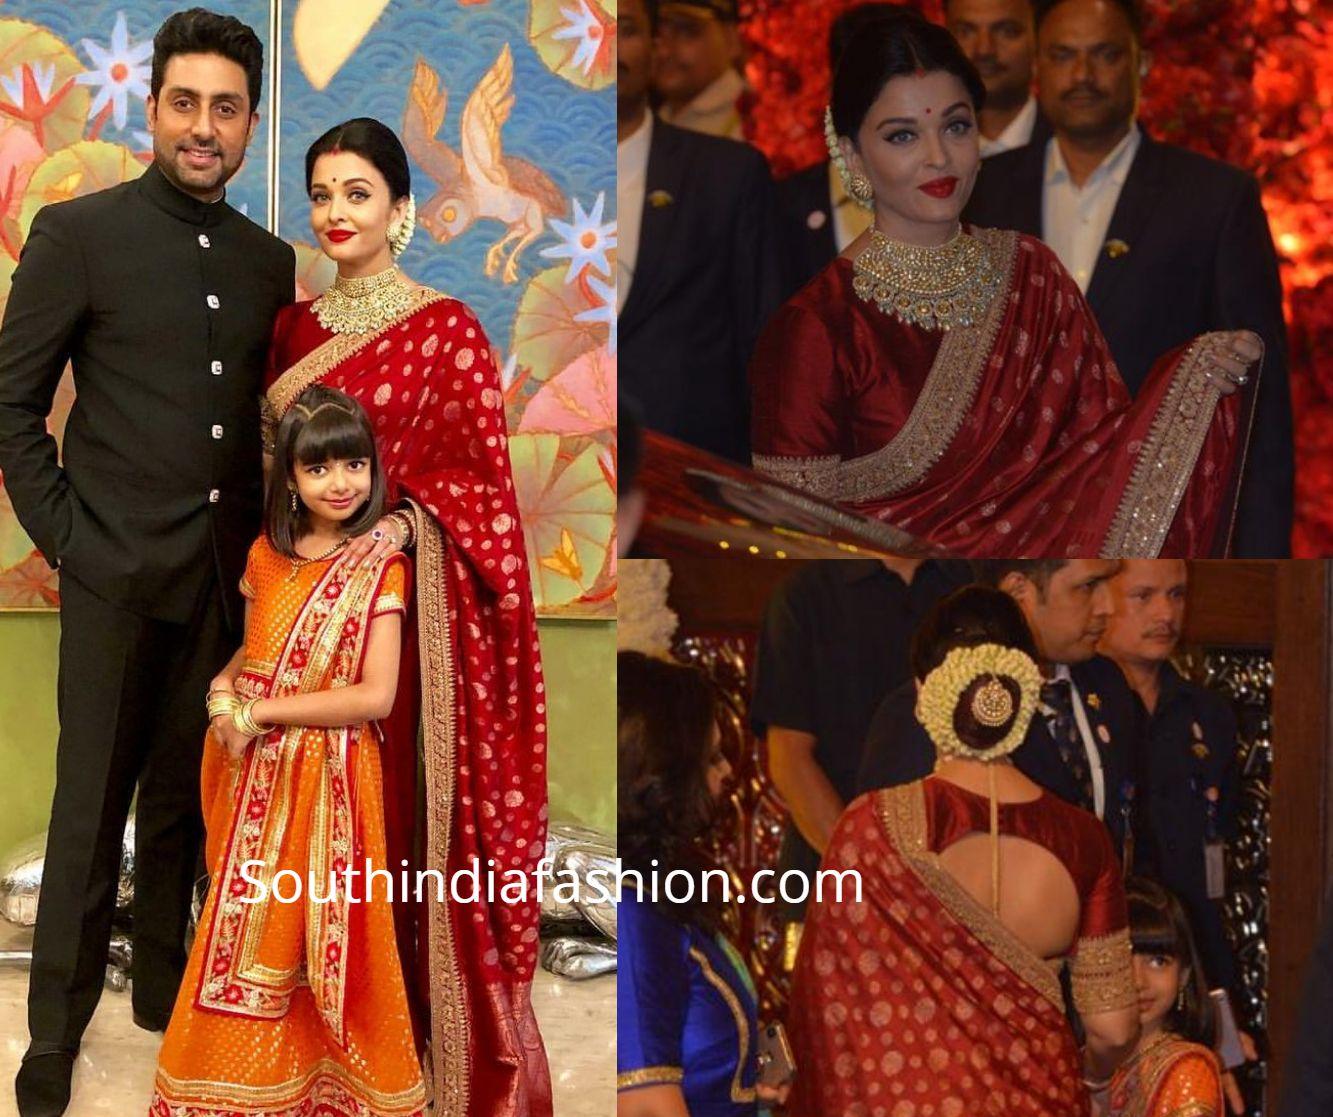 Aishwarya Rai With Family At Isha Ambani And Anand Piramal S Wedding South India Fashion Red Saree Blouse Sabyasachi Dresses Silk Saree Banarasi